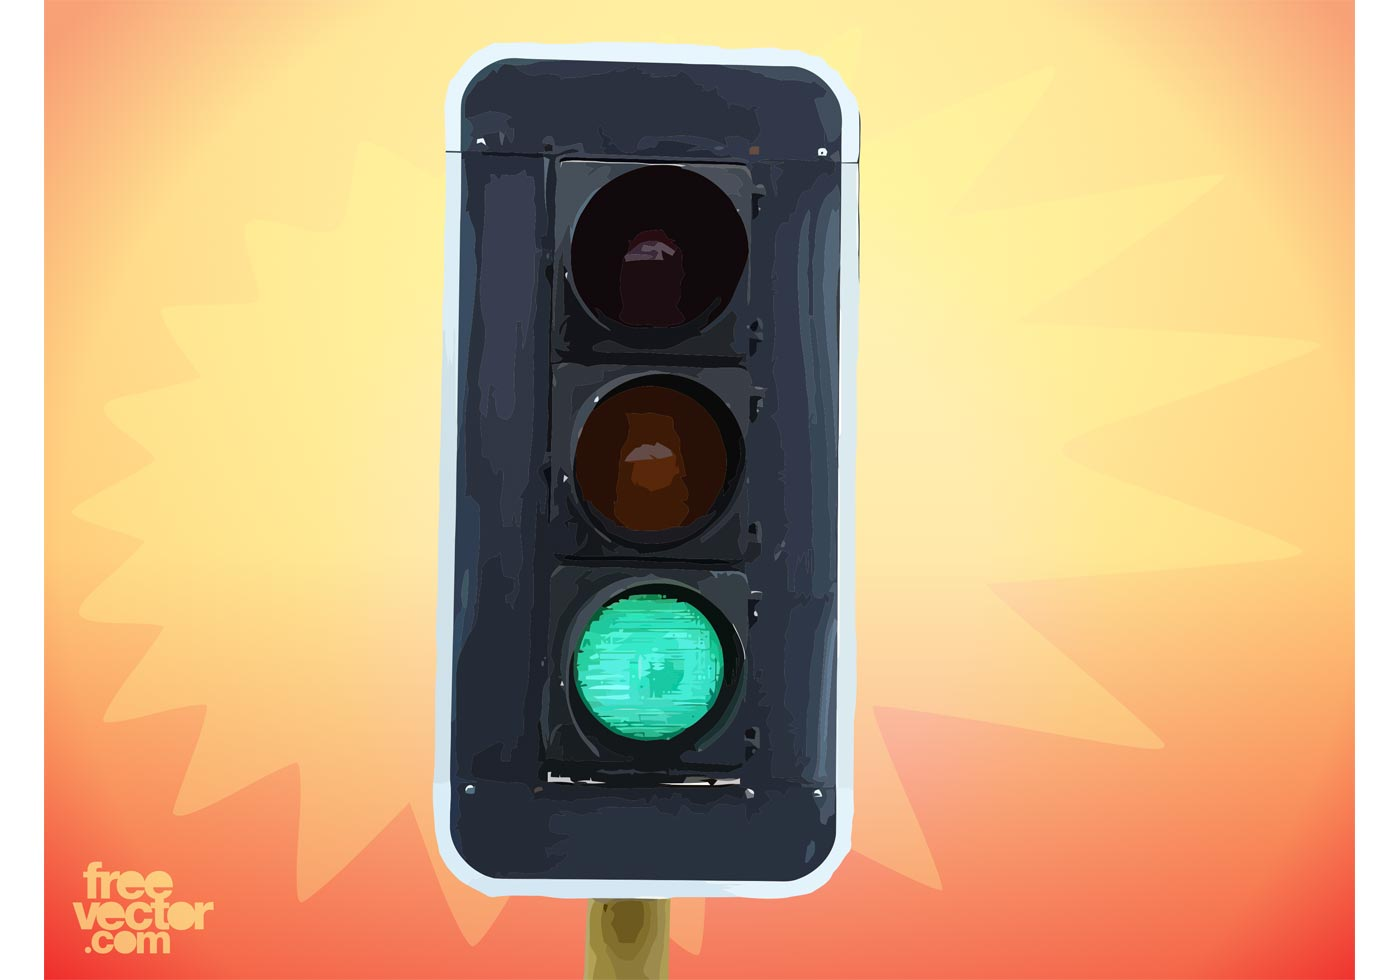 Traffic Light Demolition : Vertical traffic light download free vector art stock